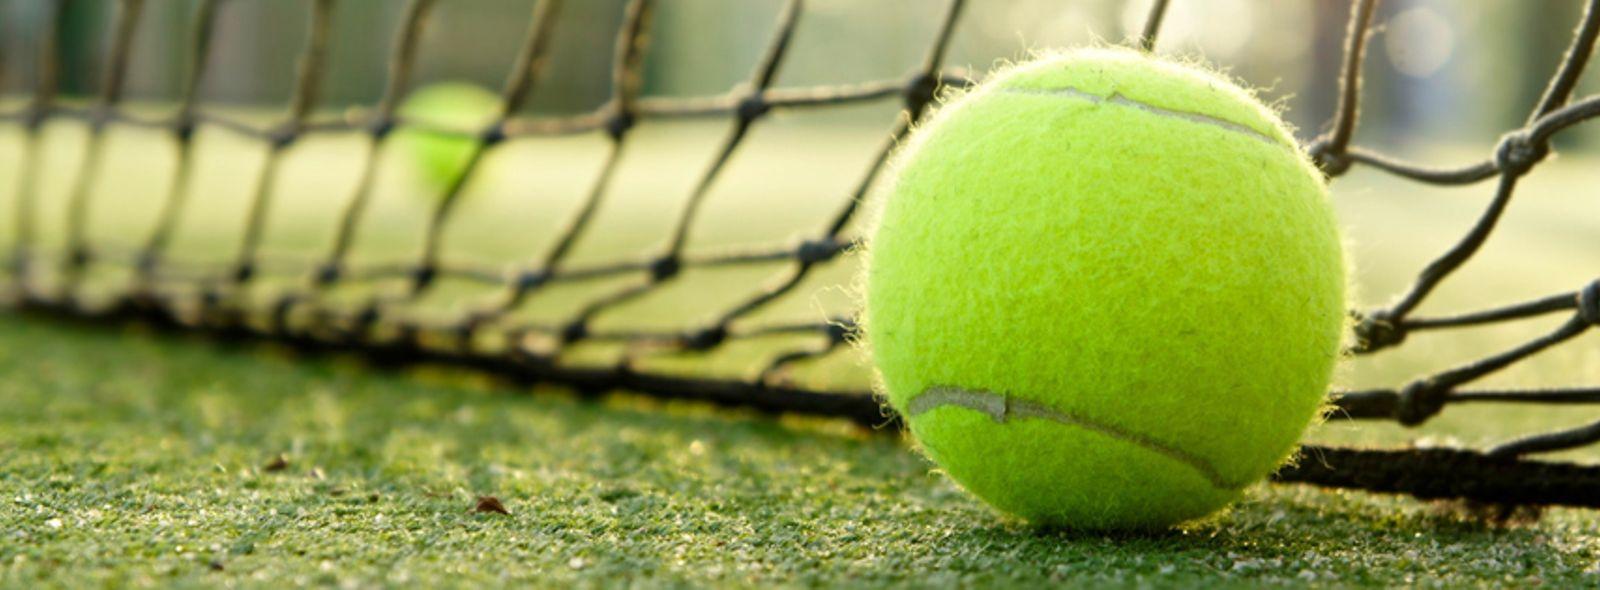 Campi Da Tennis Roma.Campi Da Tennis Roma Trovami